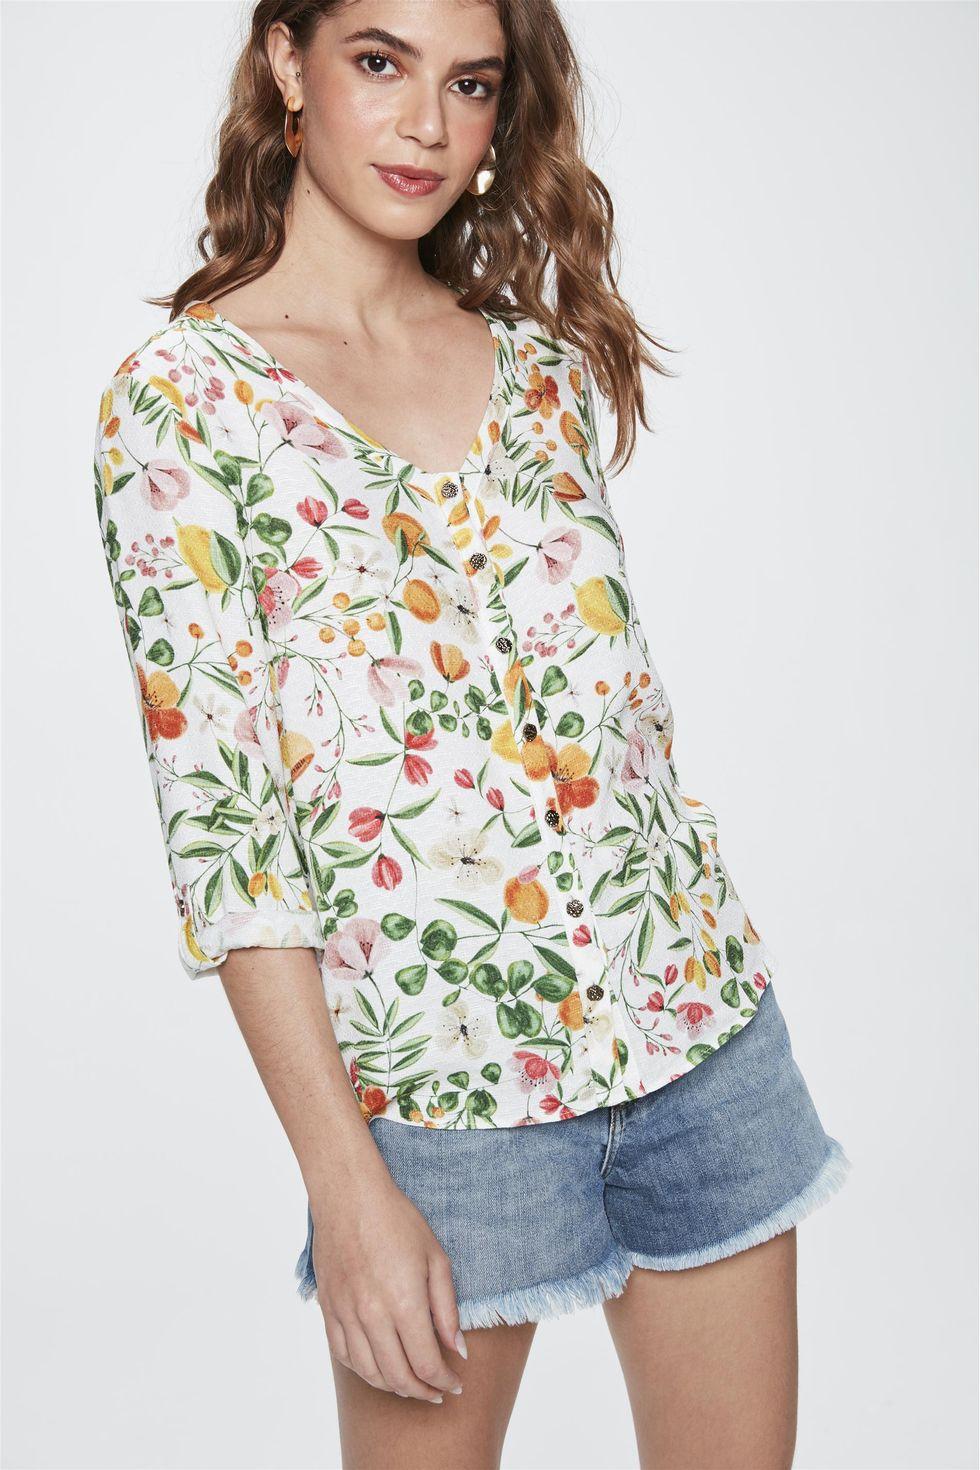 Camisa-com-Estampa-Floral-Feminina-Frente--